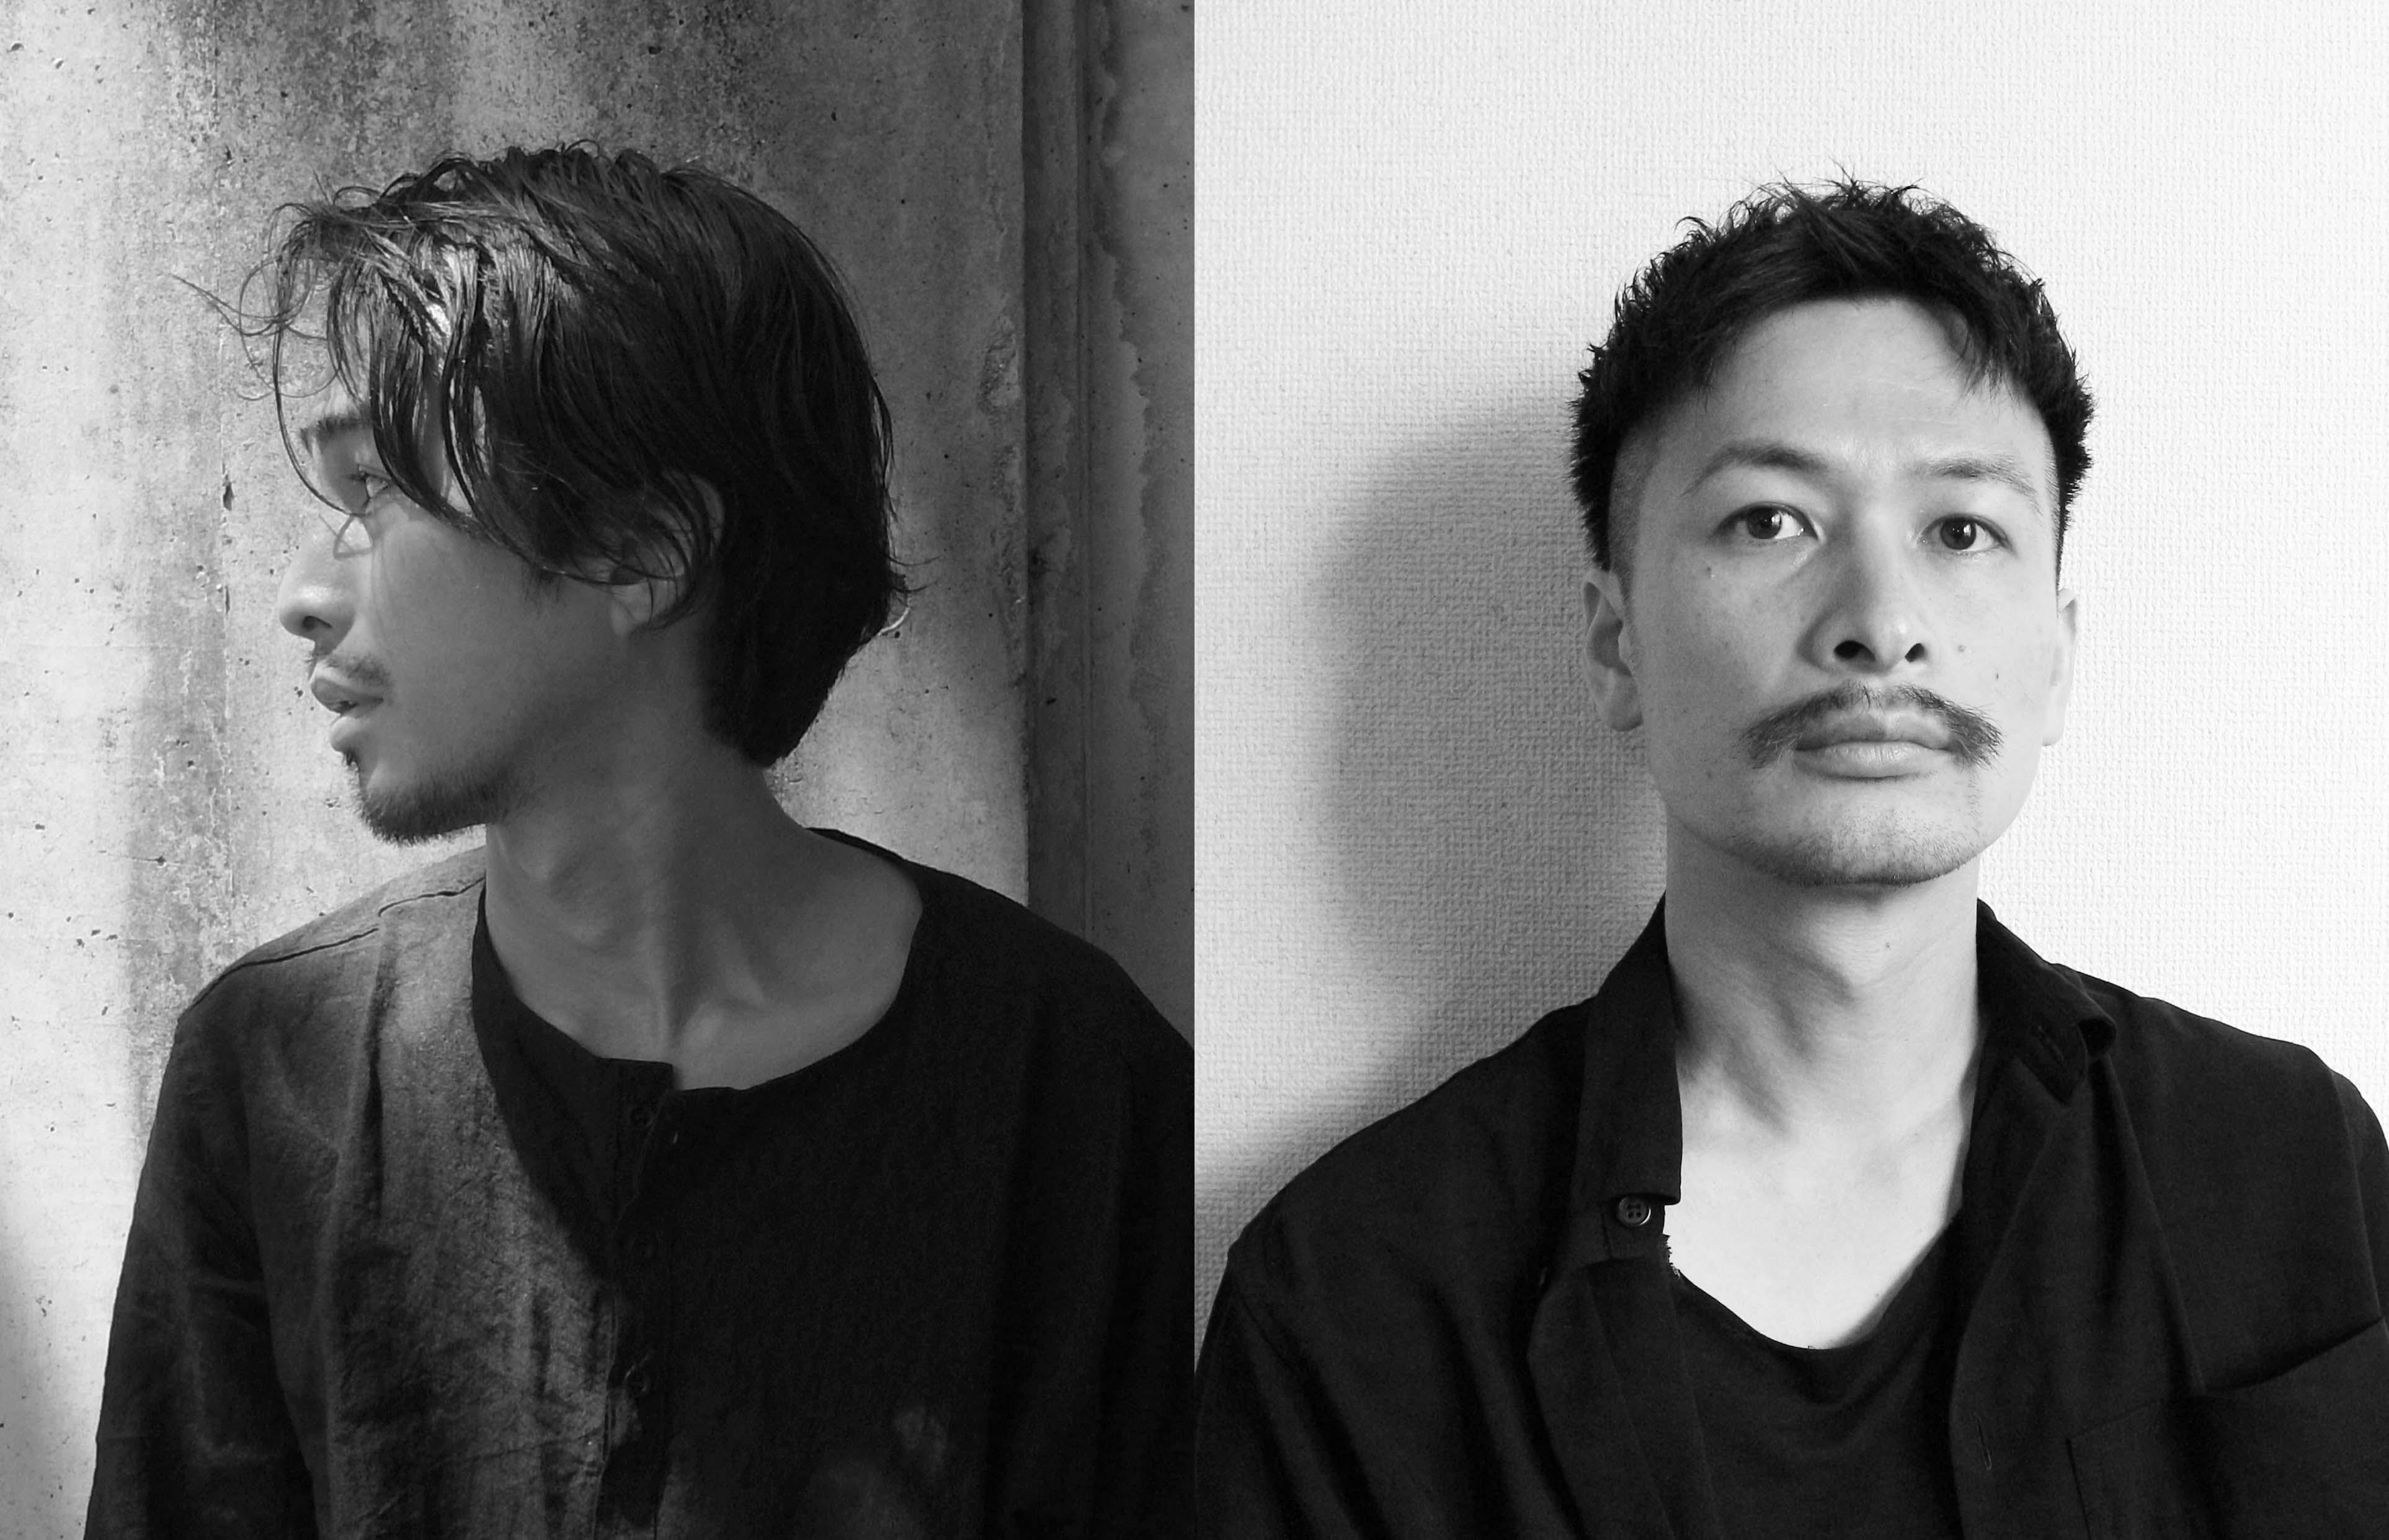 YOSHIHIRO MIKAMI+HAJIME YOSHIDA